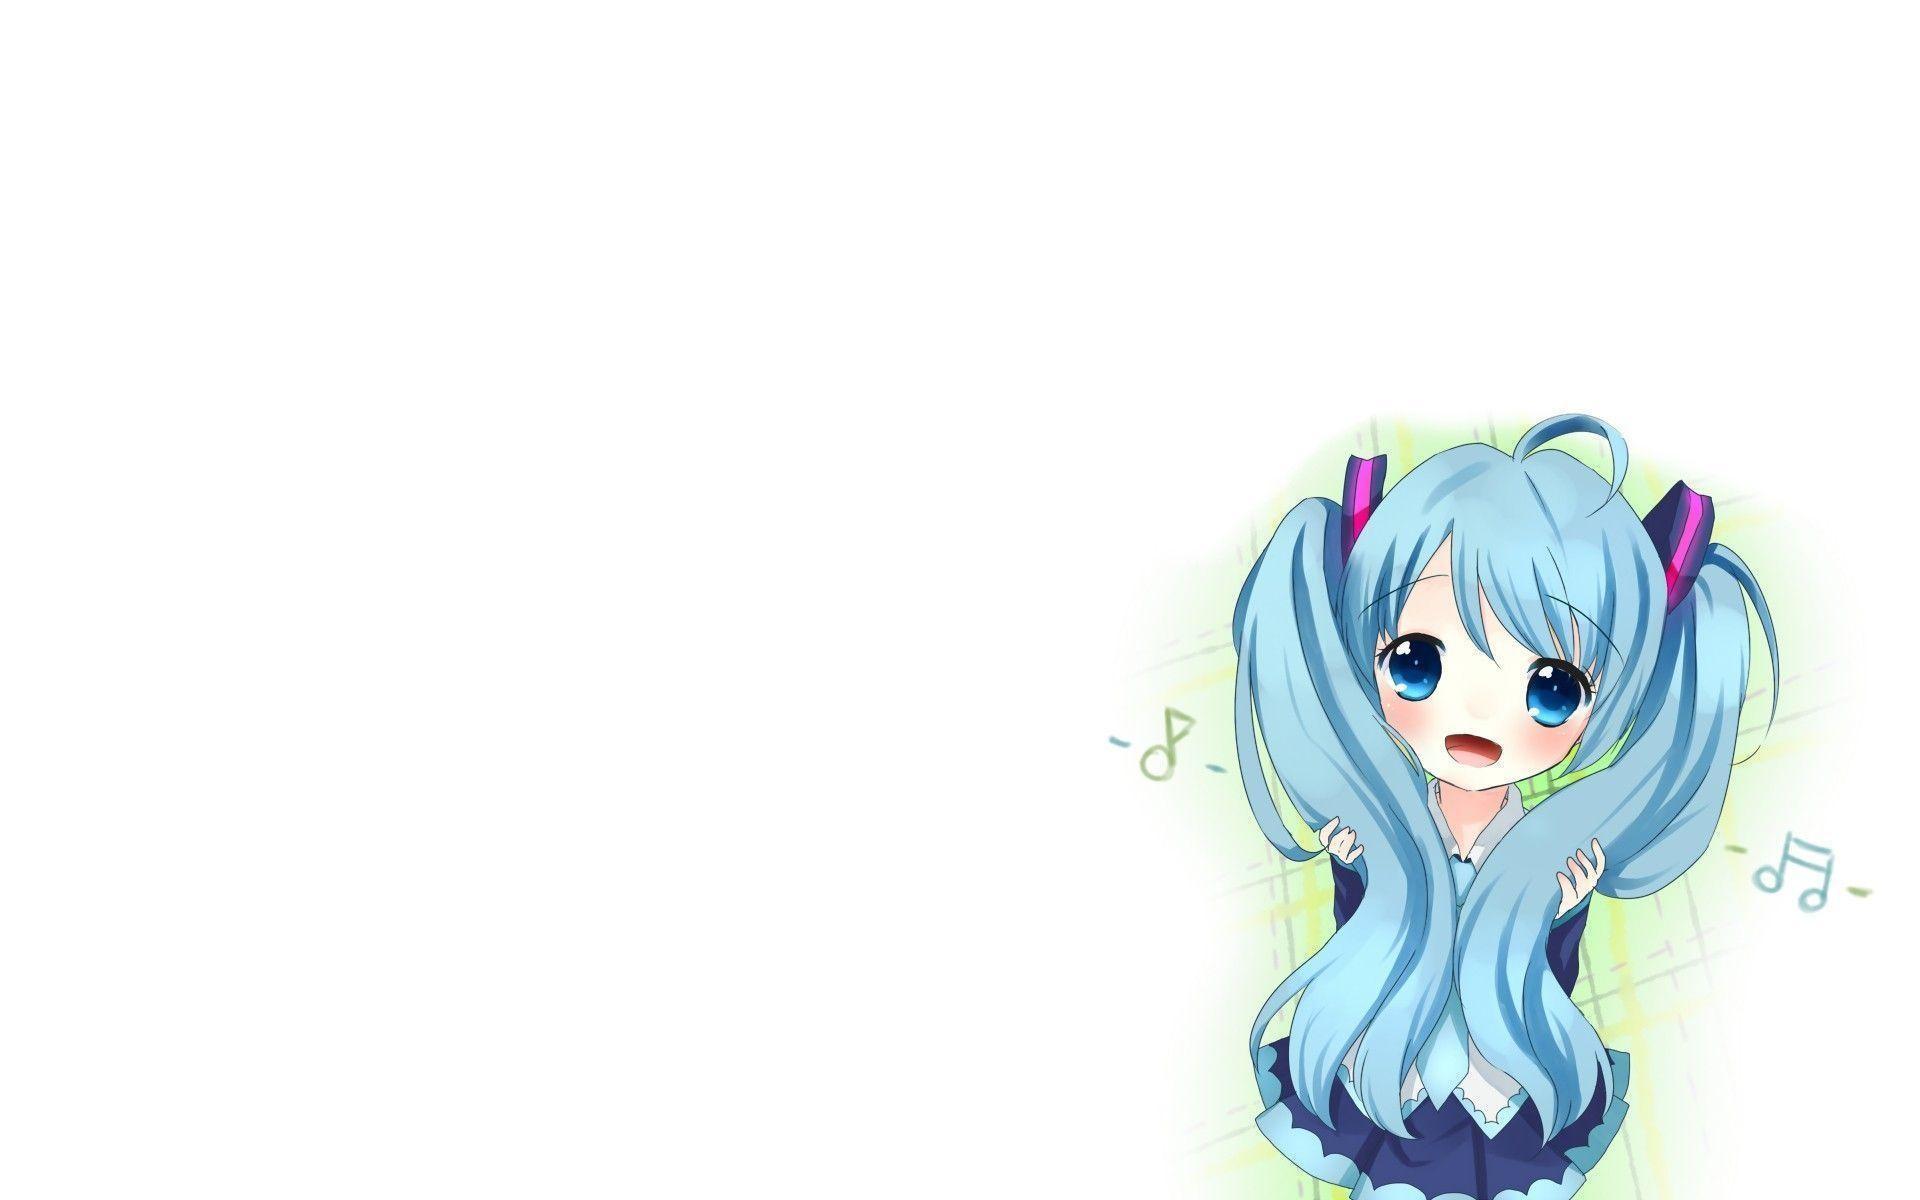 Vocaloid chibi wallpaper wallpapertag - Chibi background ...